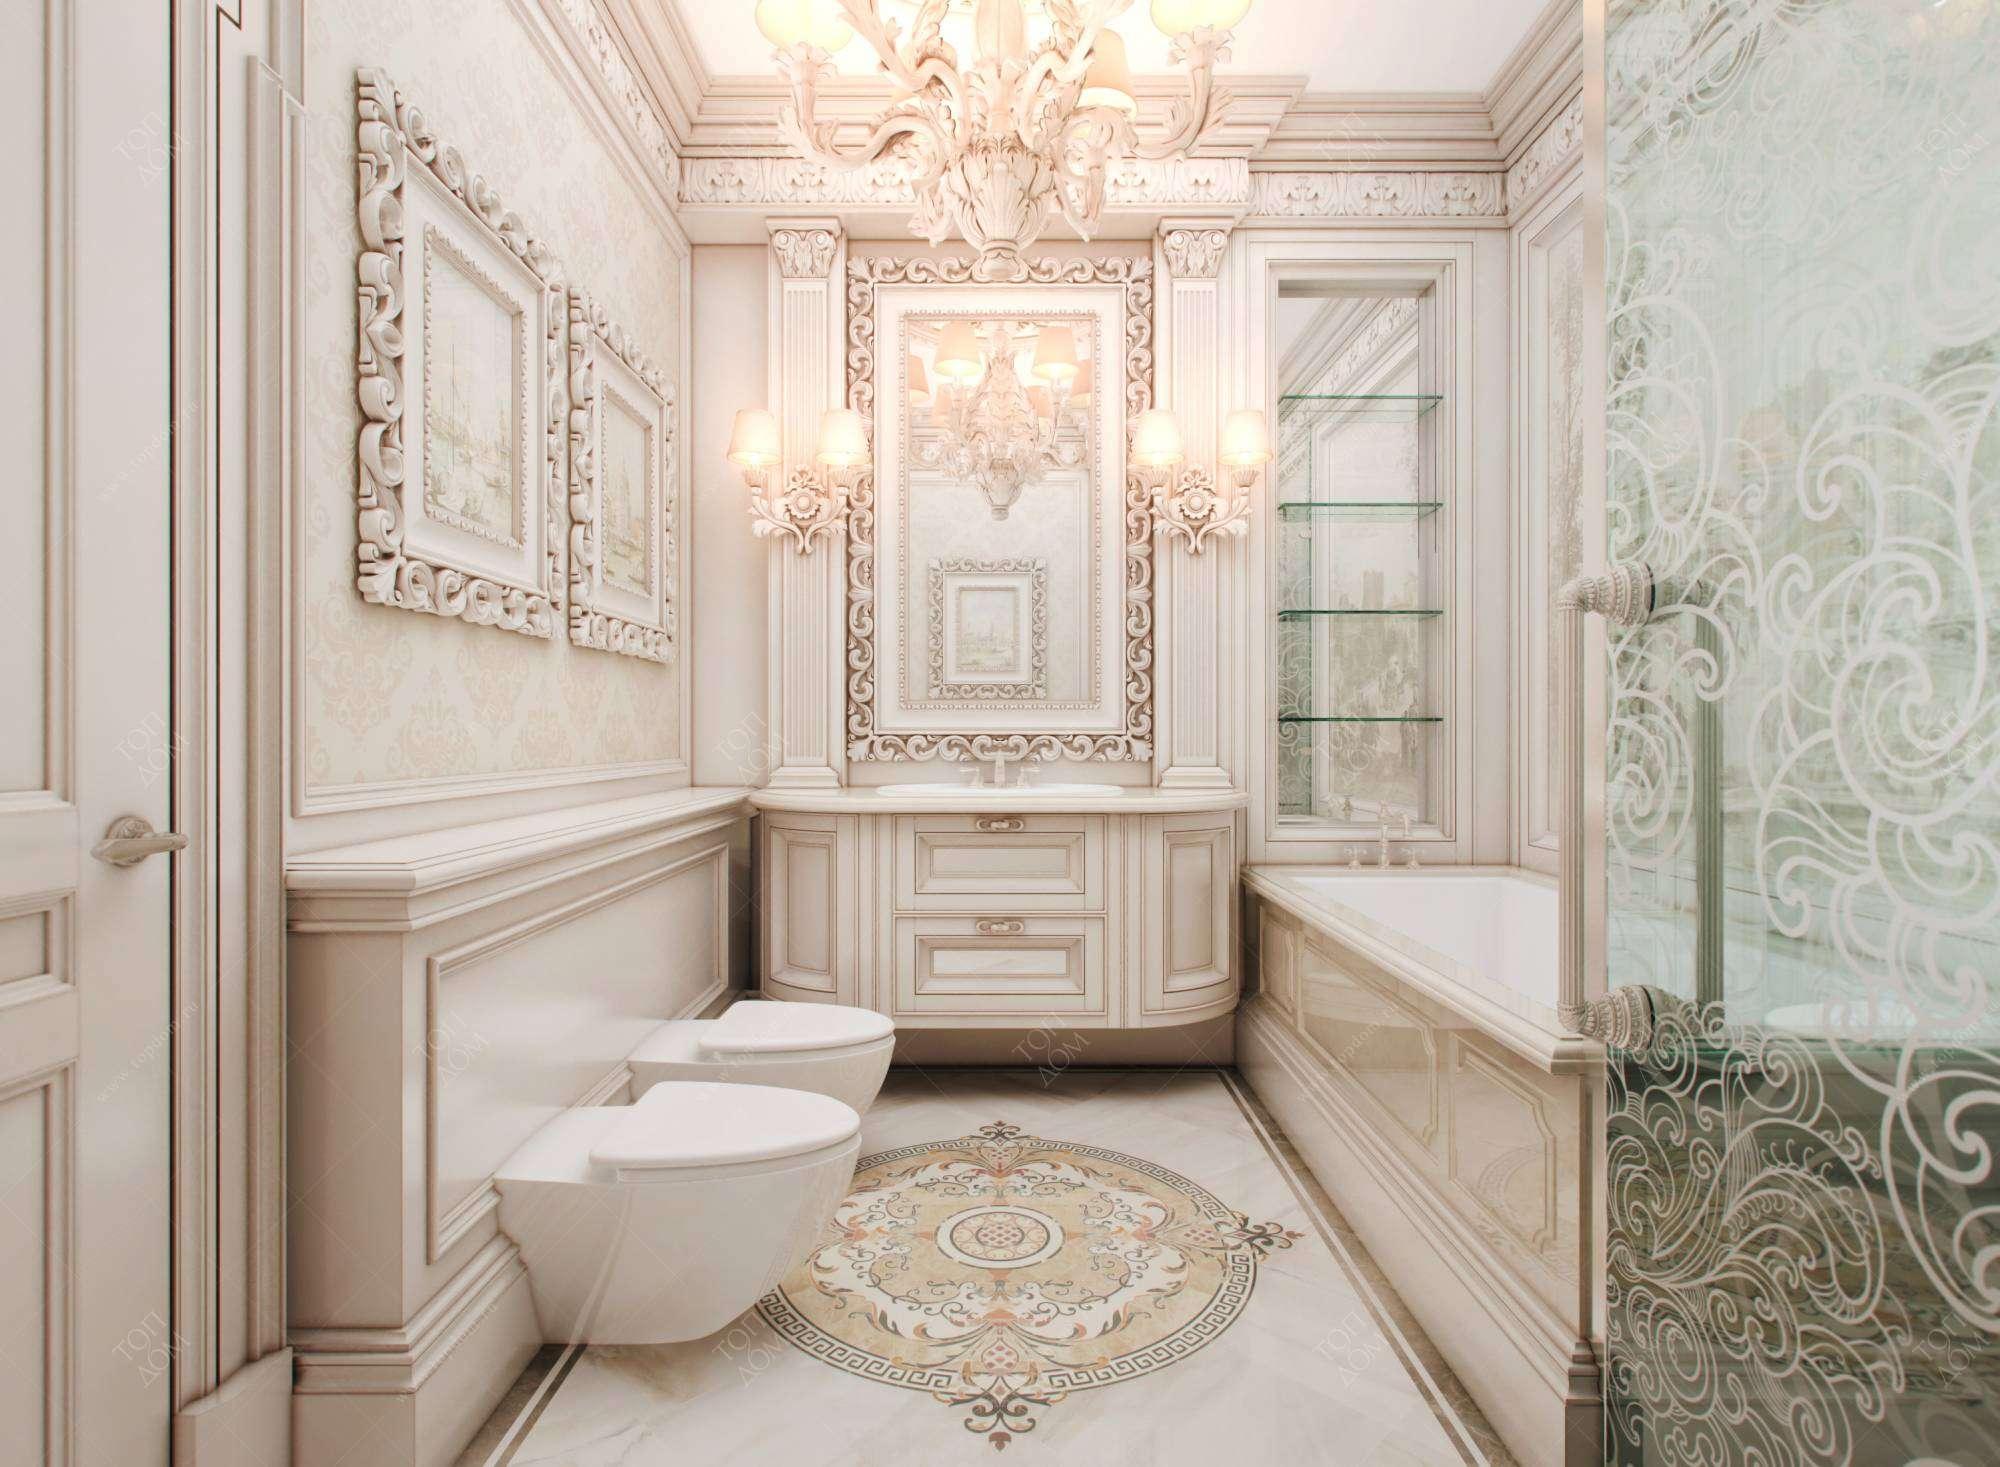 светильники на зеркало в ванной комнате фото